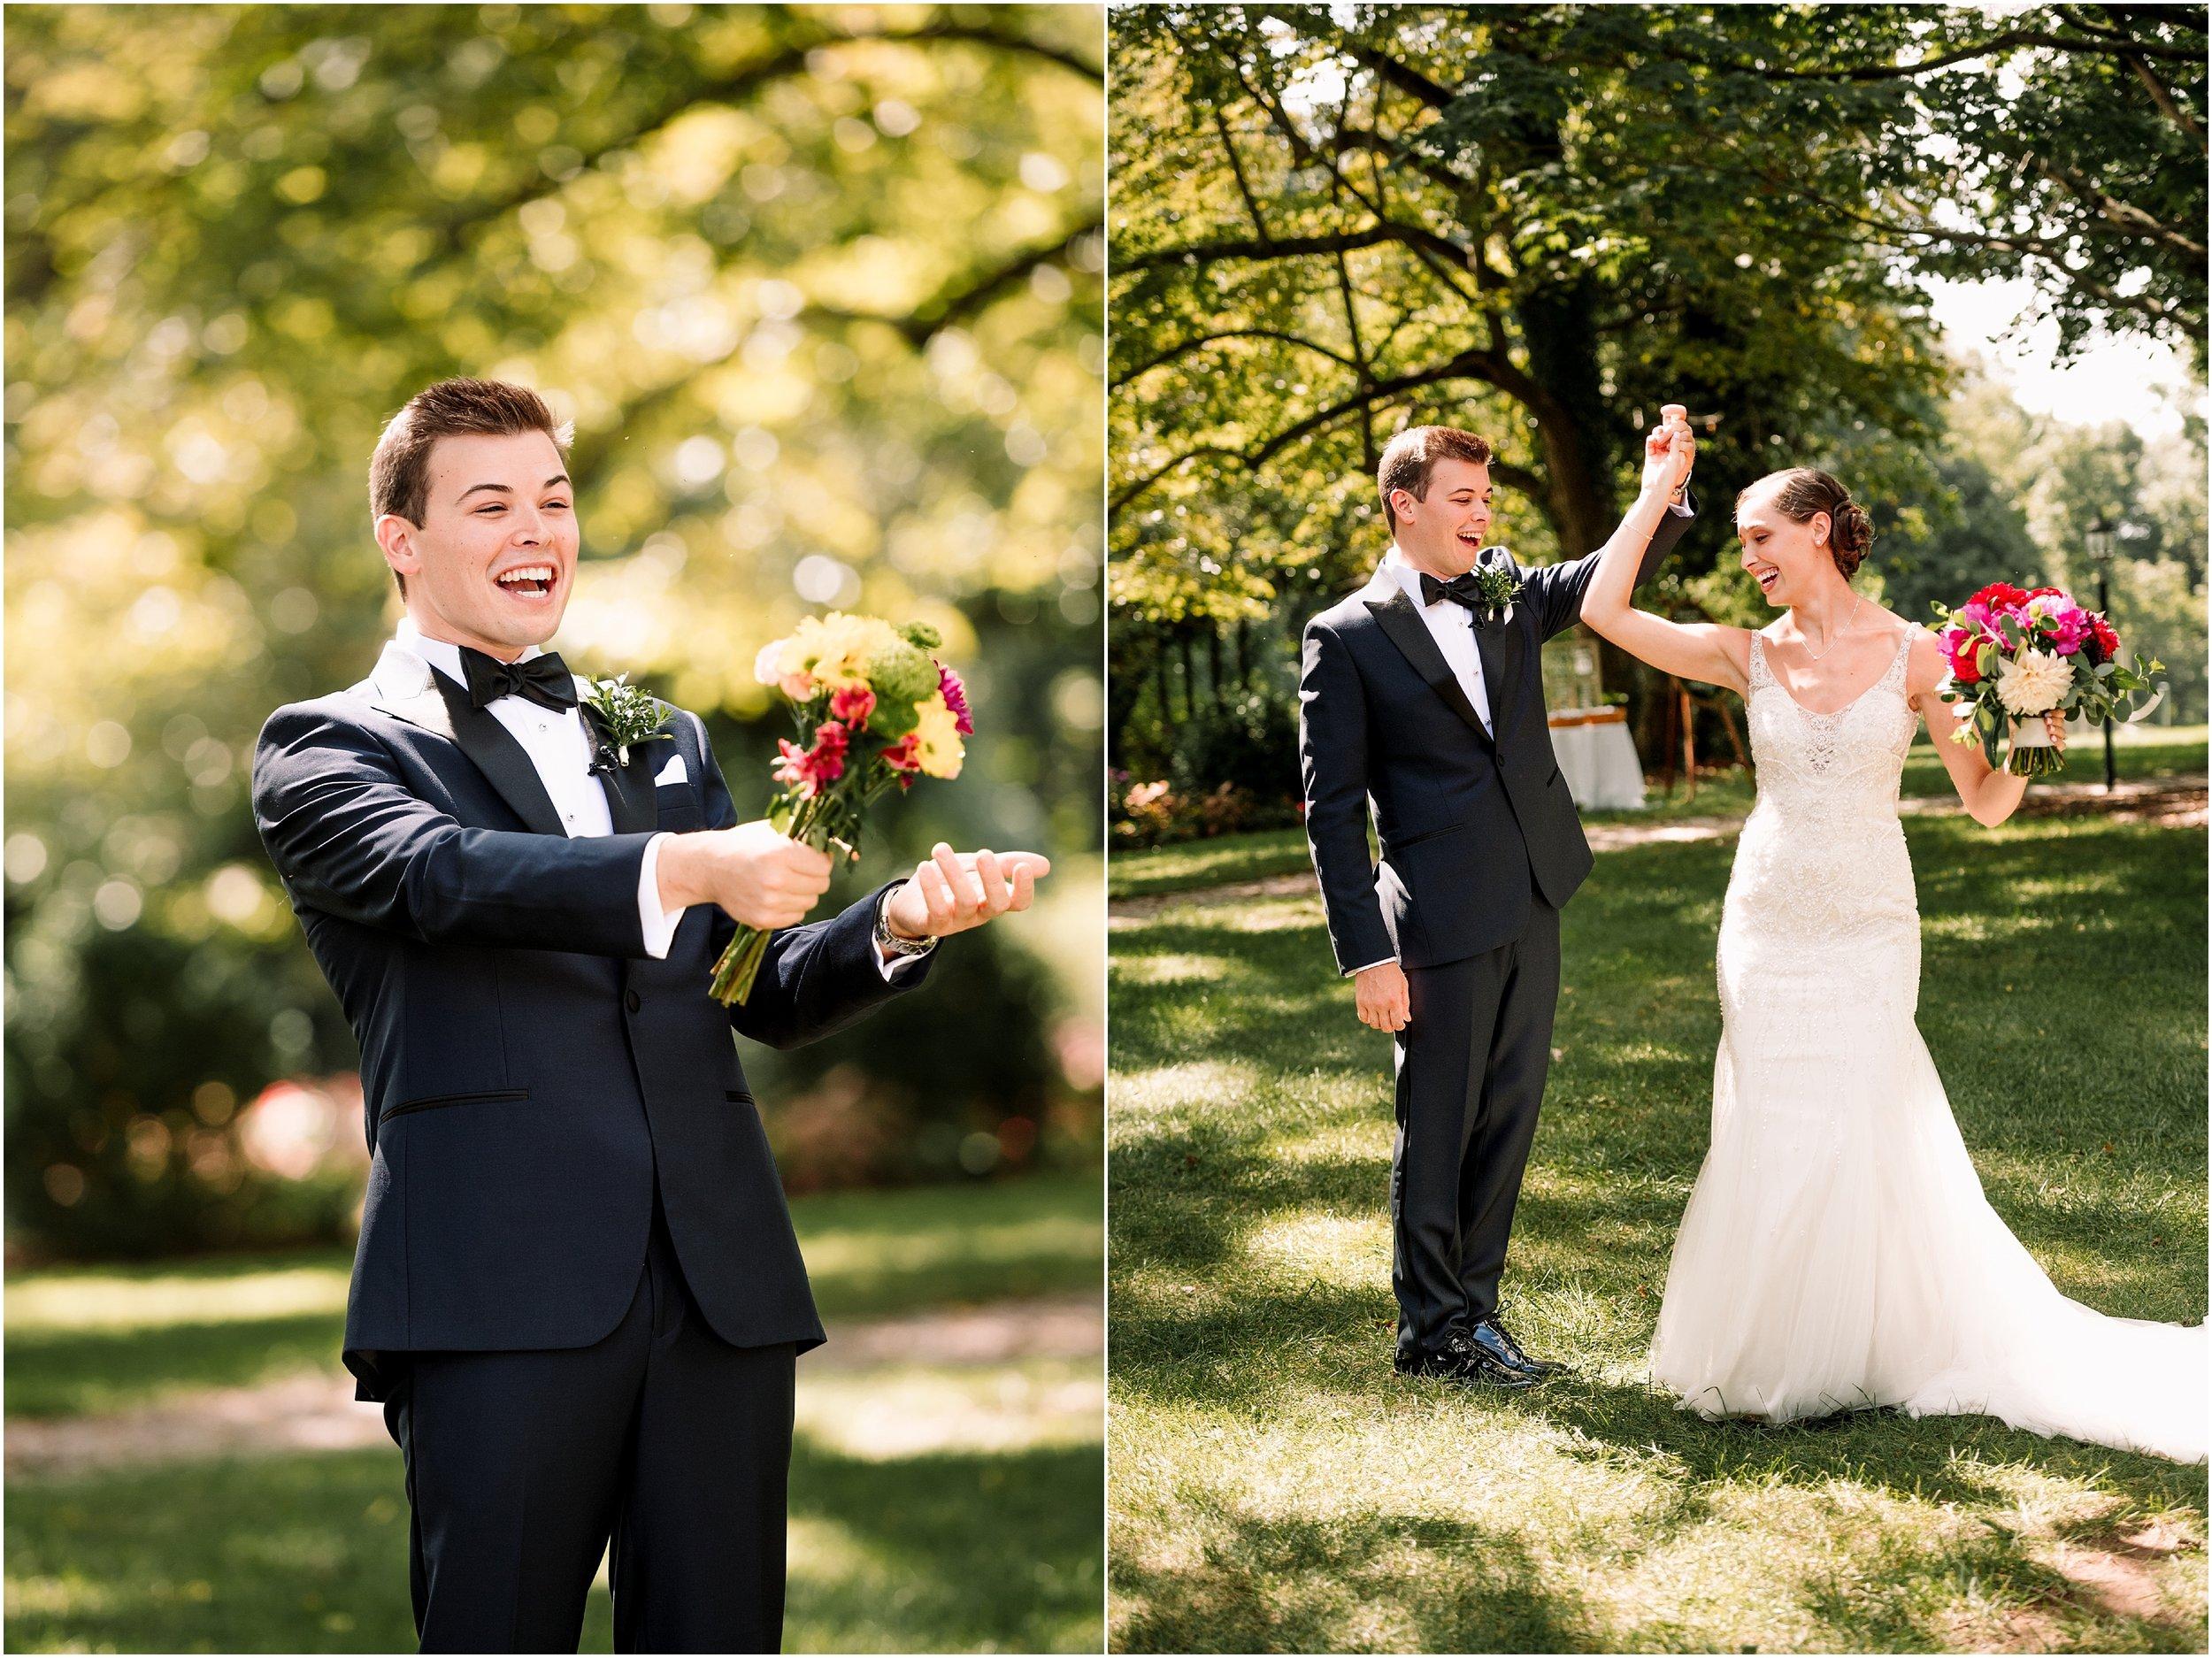 hannah leigh photography Antrim 1844 Wedding_1164.jpg